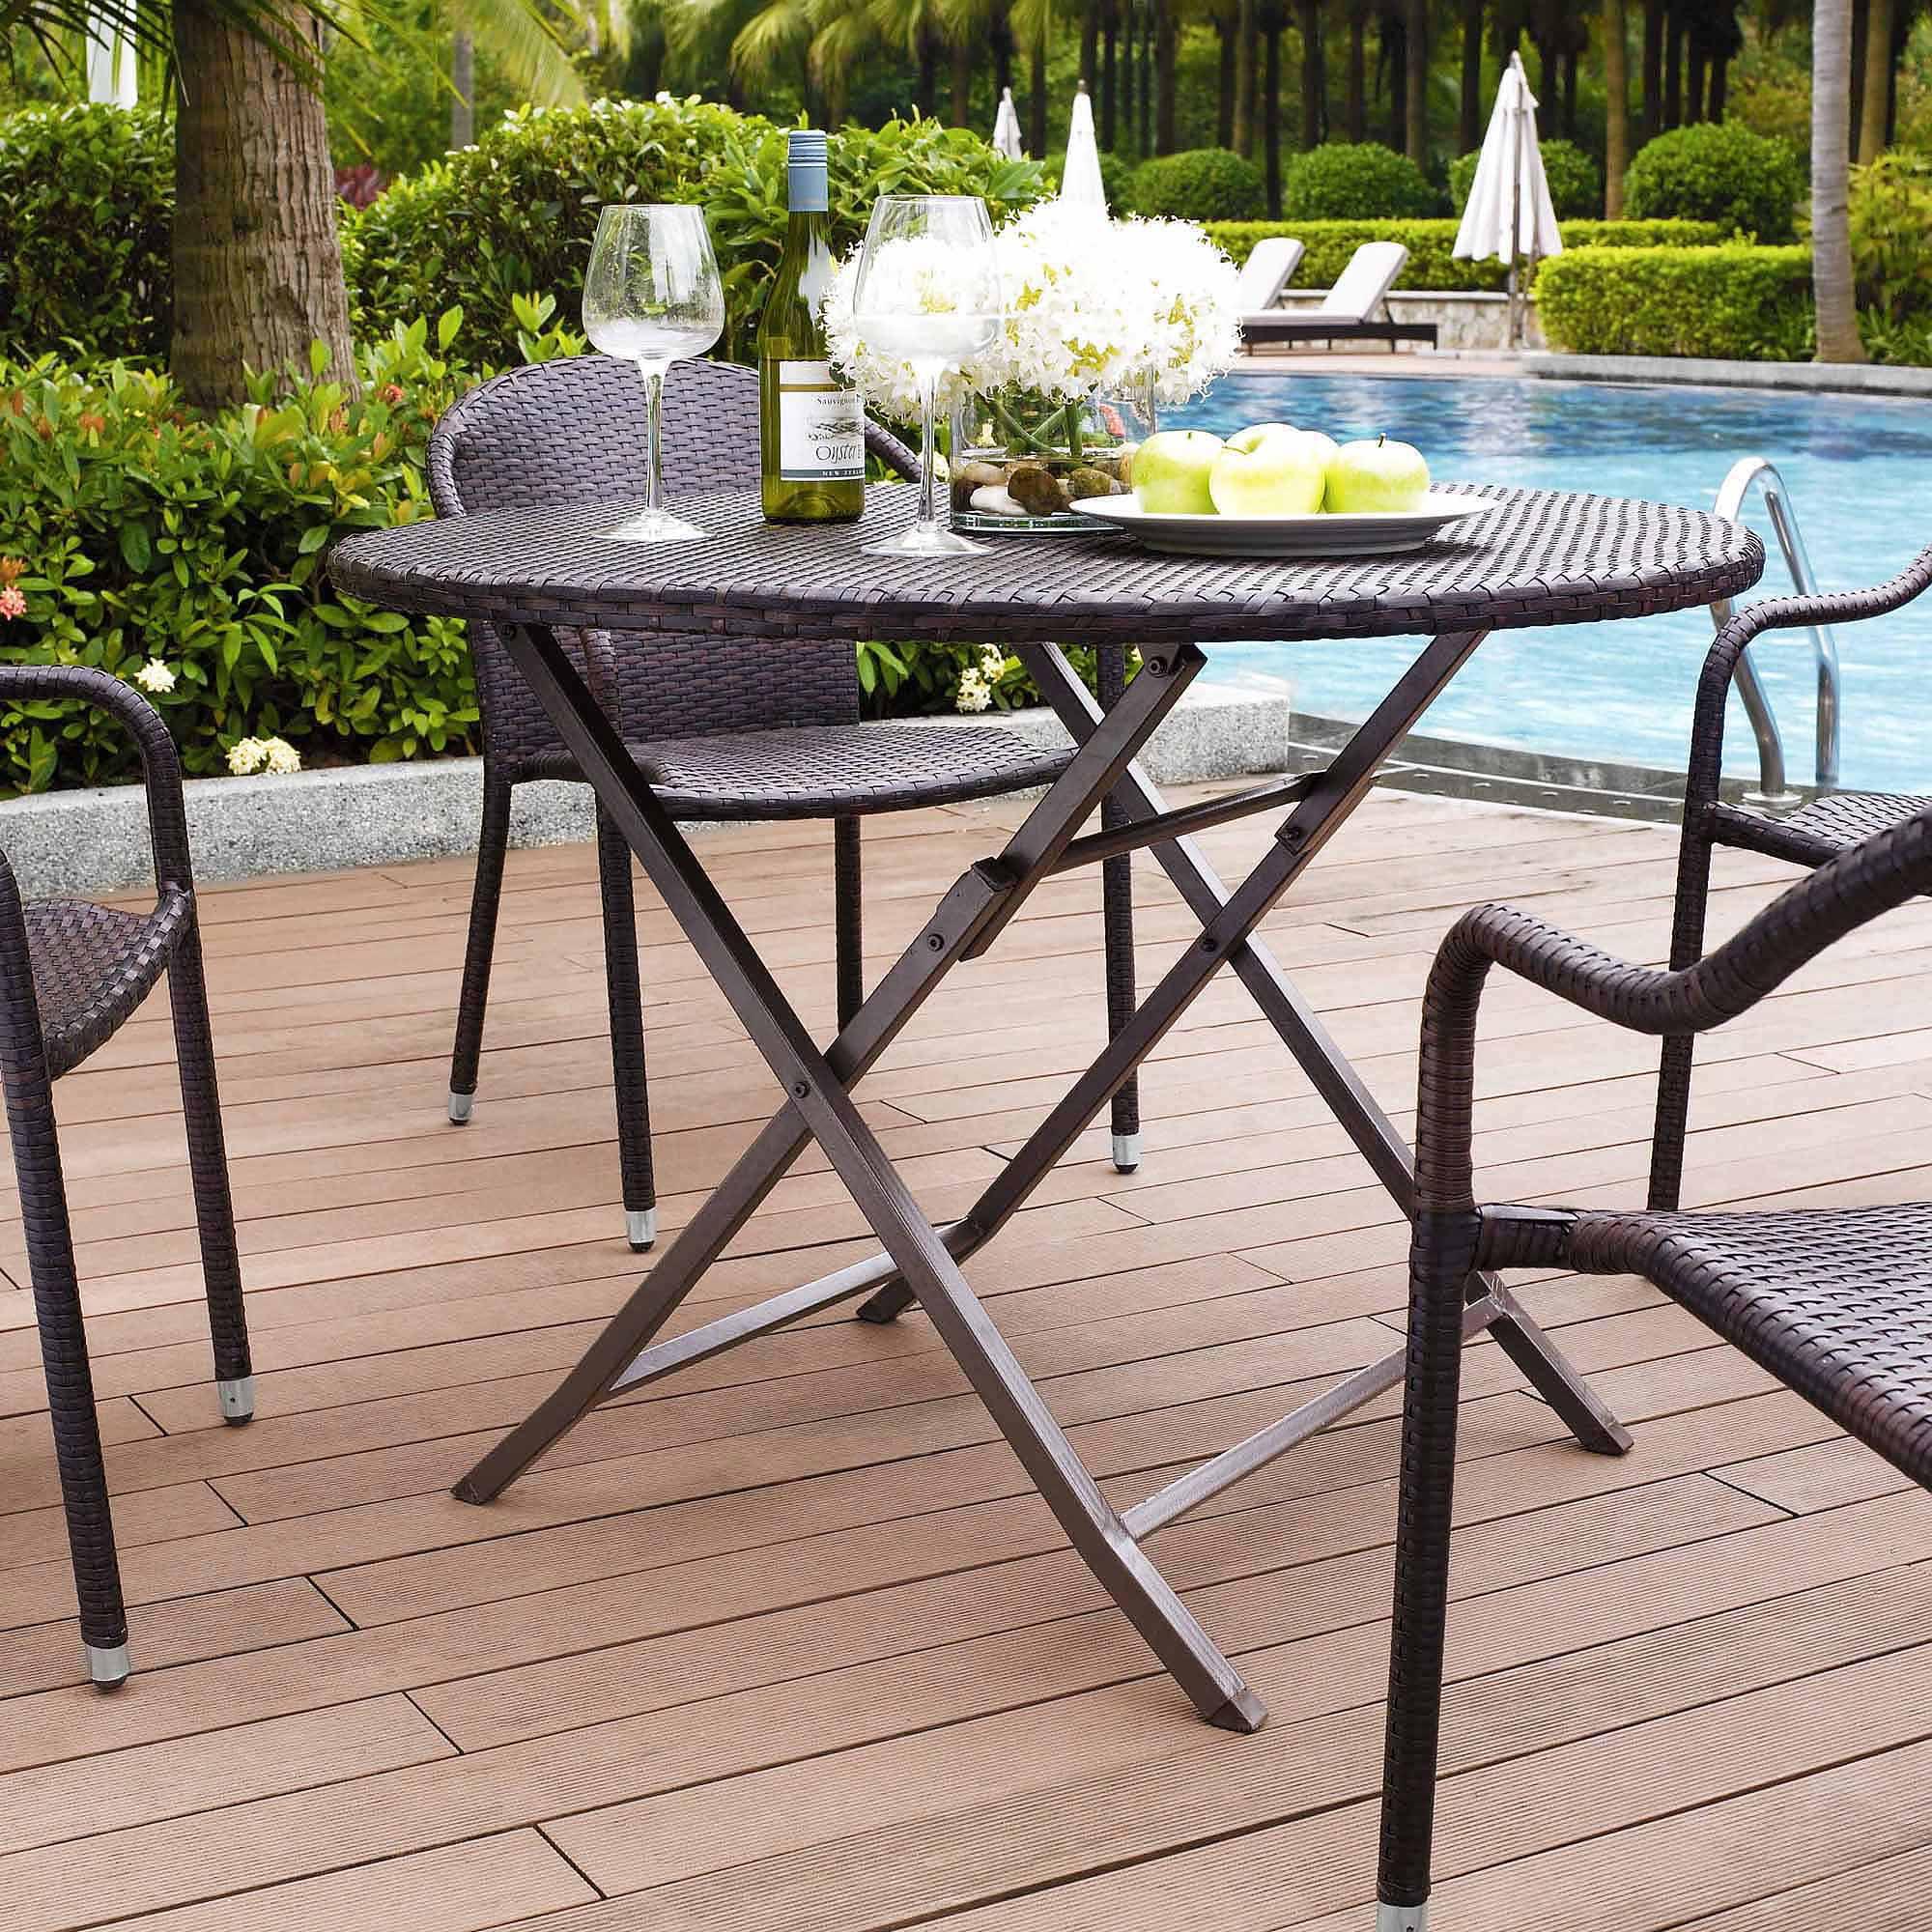 Crosley Furniture Palm Harbor Outdoor Wicker Folding Table